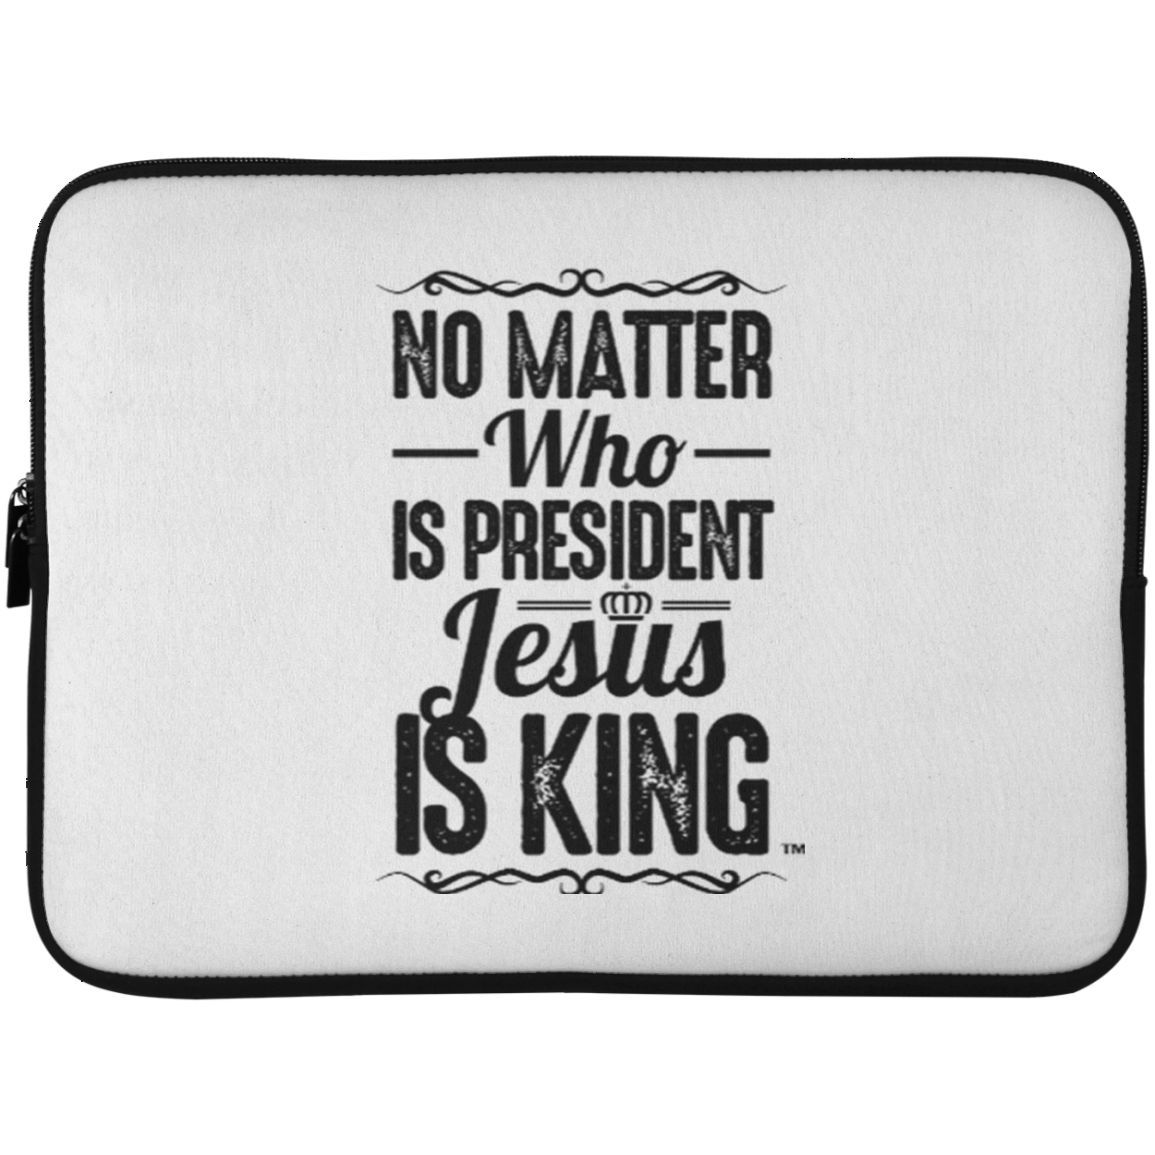 Jesus is King -- Laptop Sleeve - 15 Inch